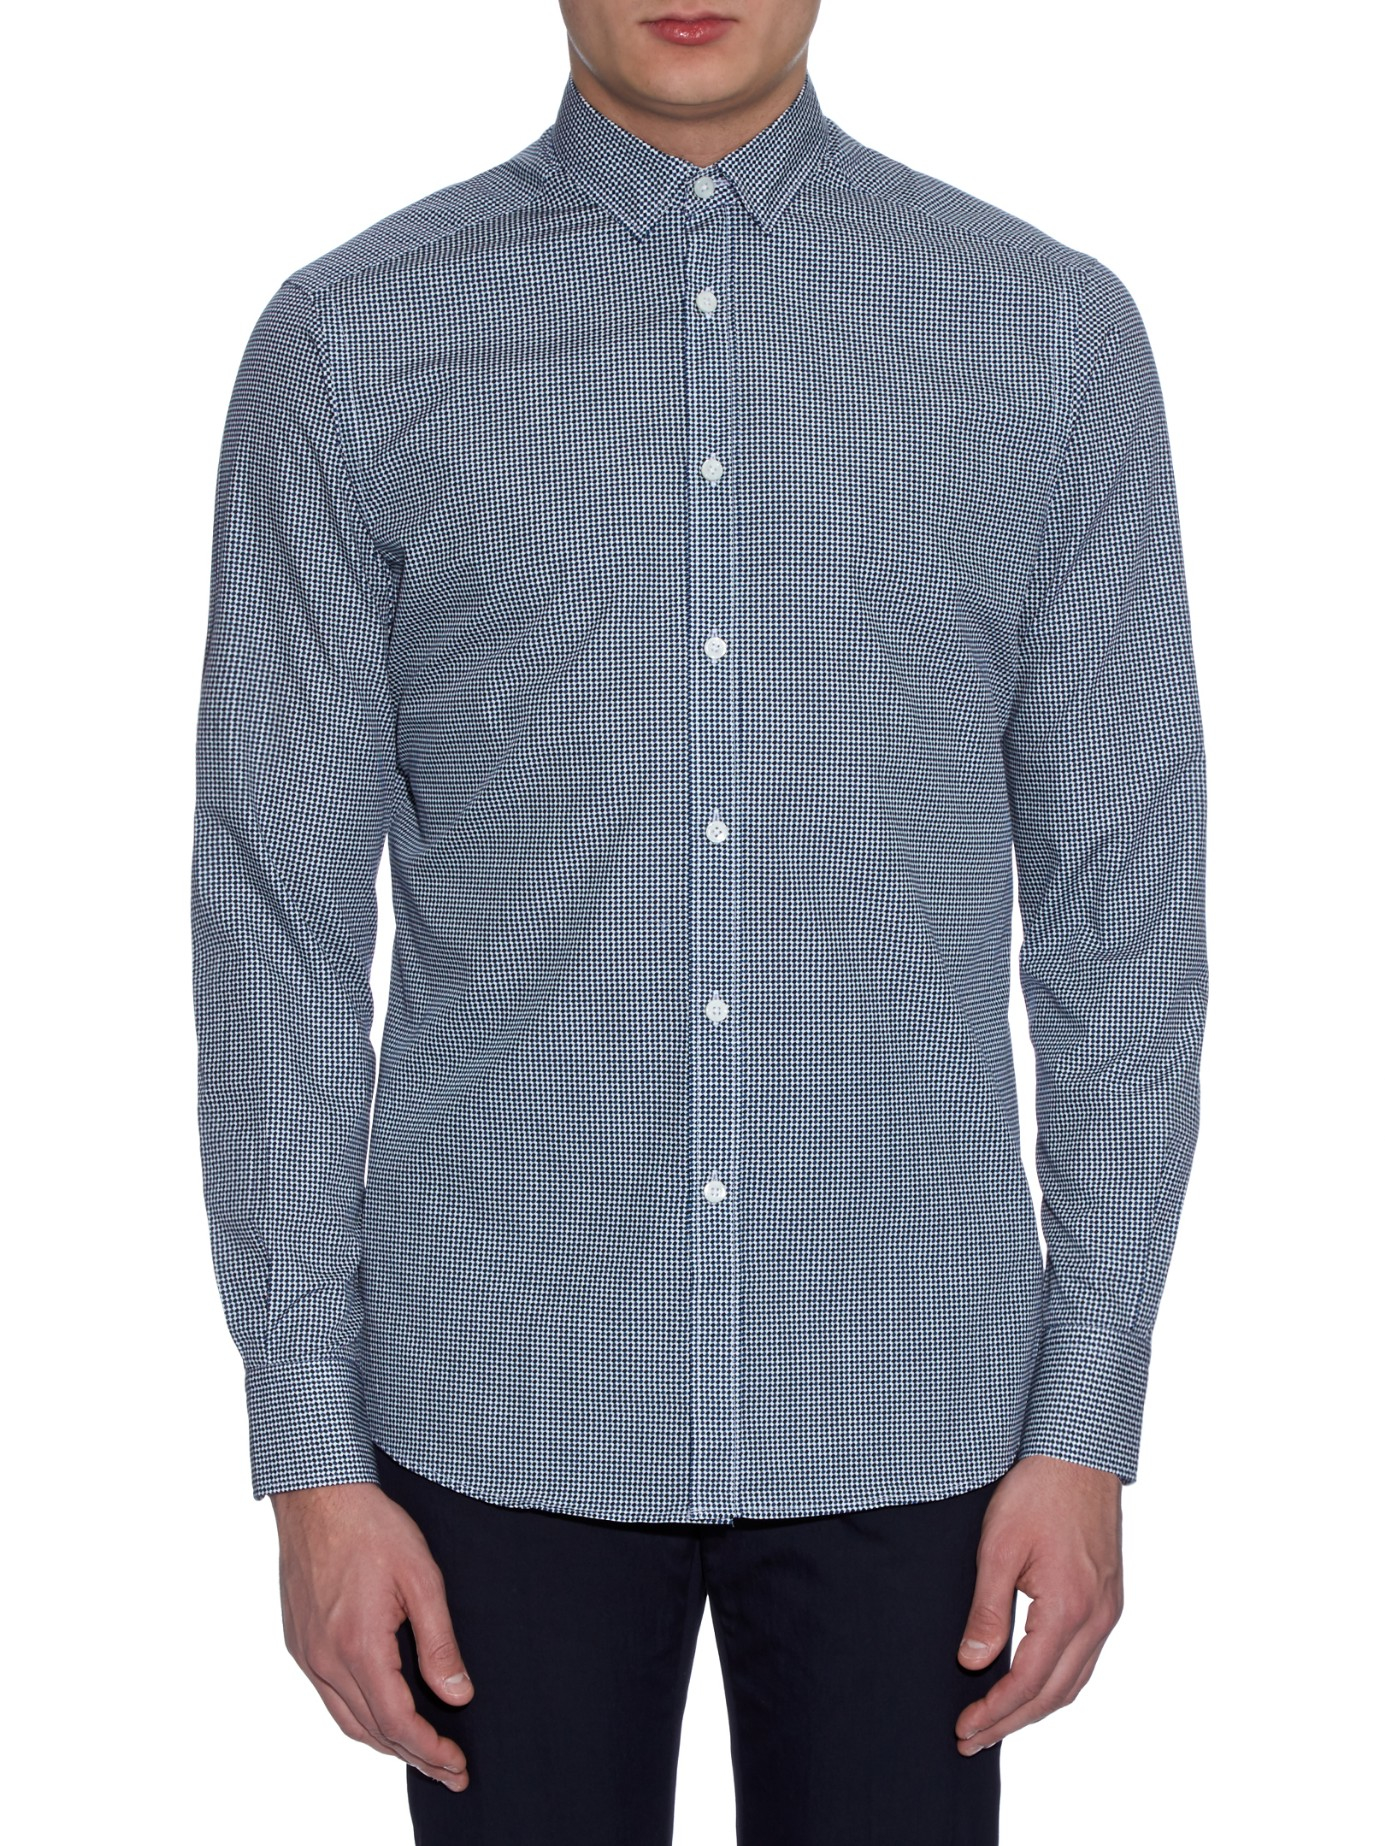 lyst ermenegildo zegna retro weave print shirt in blue for men. Black Bedroom Furniture Sets. Home Design Ideas